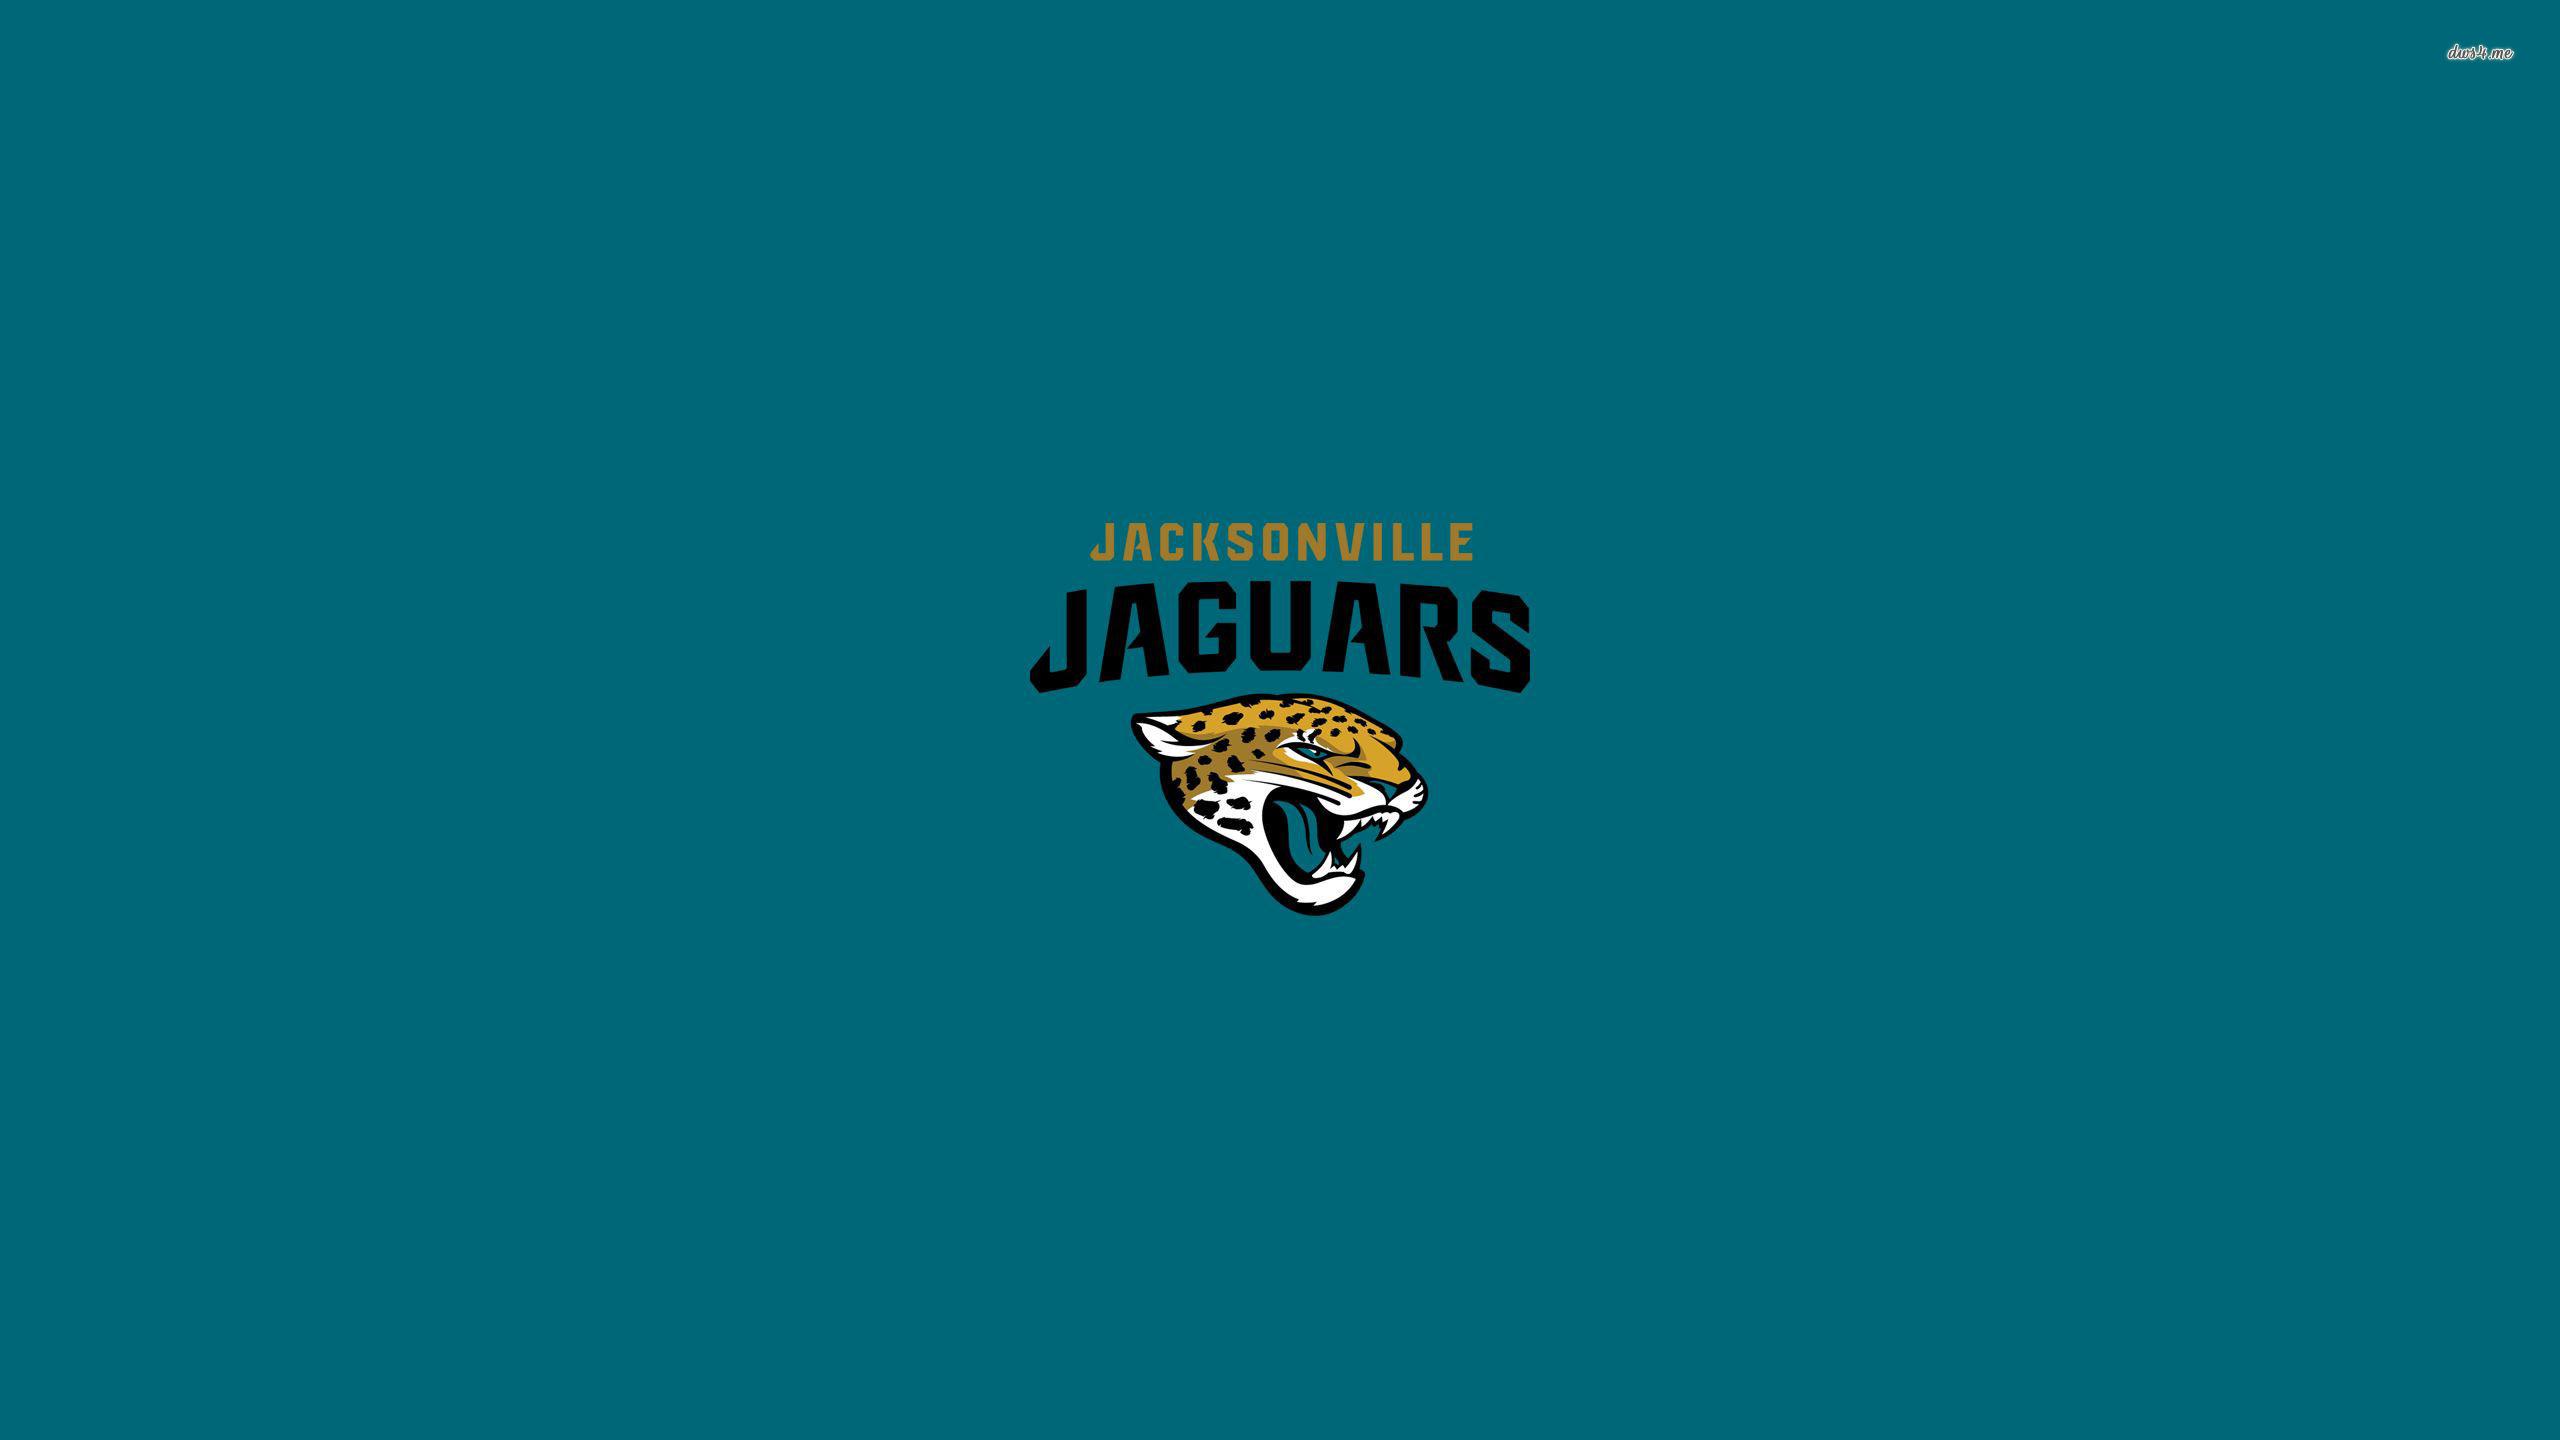 Jacksonville Jaguars wallpaper   Sport wallpapers   24628 2560x1440